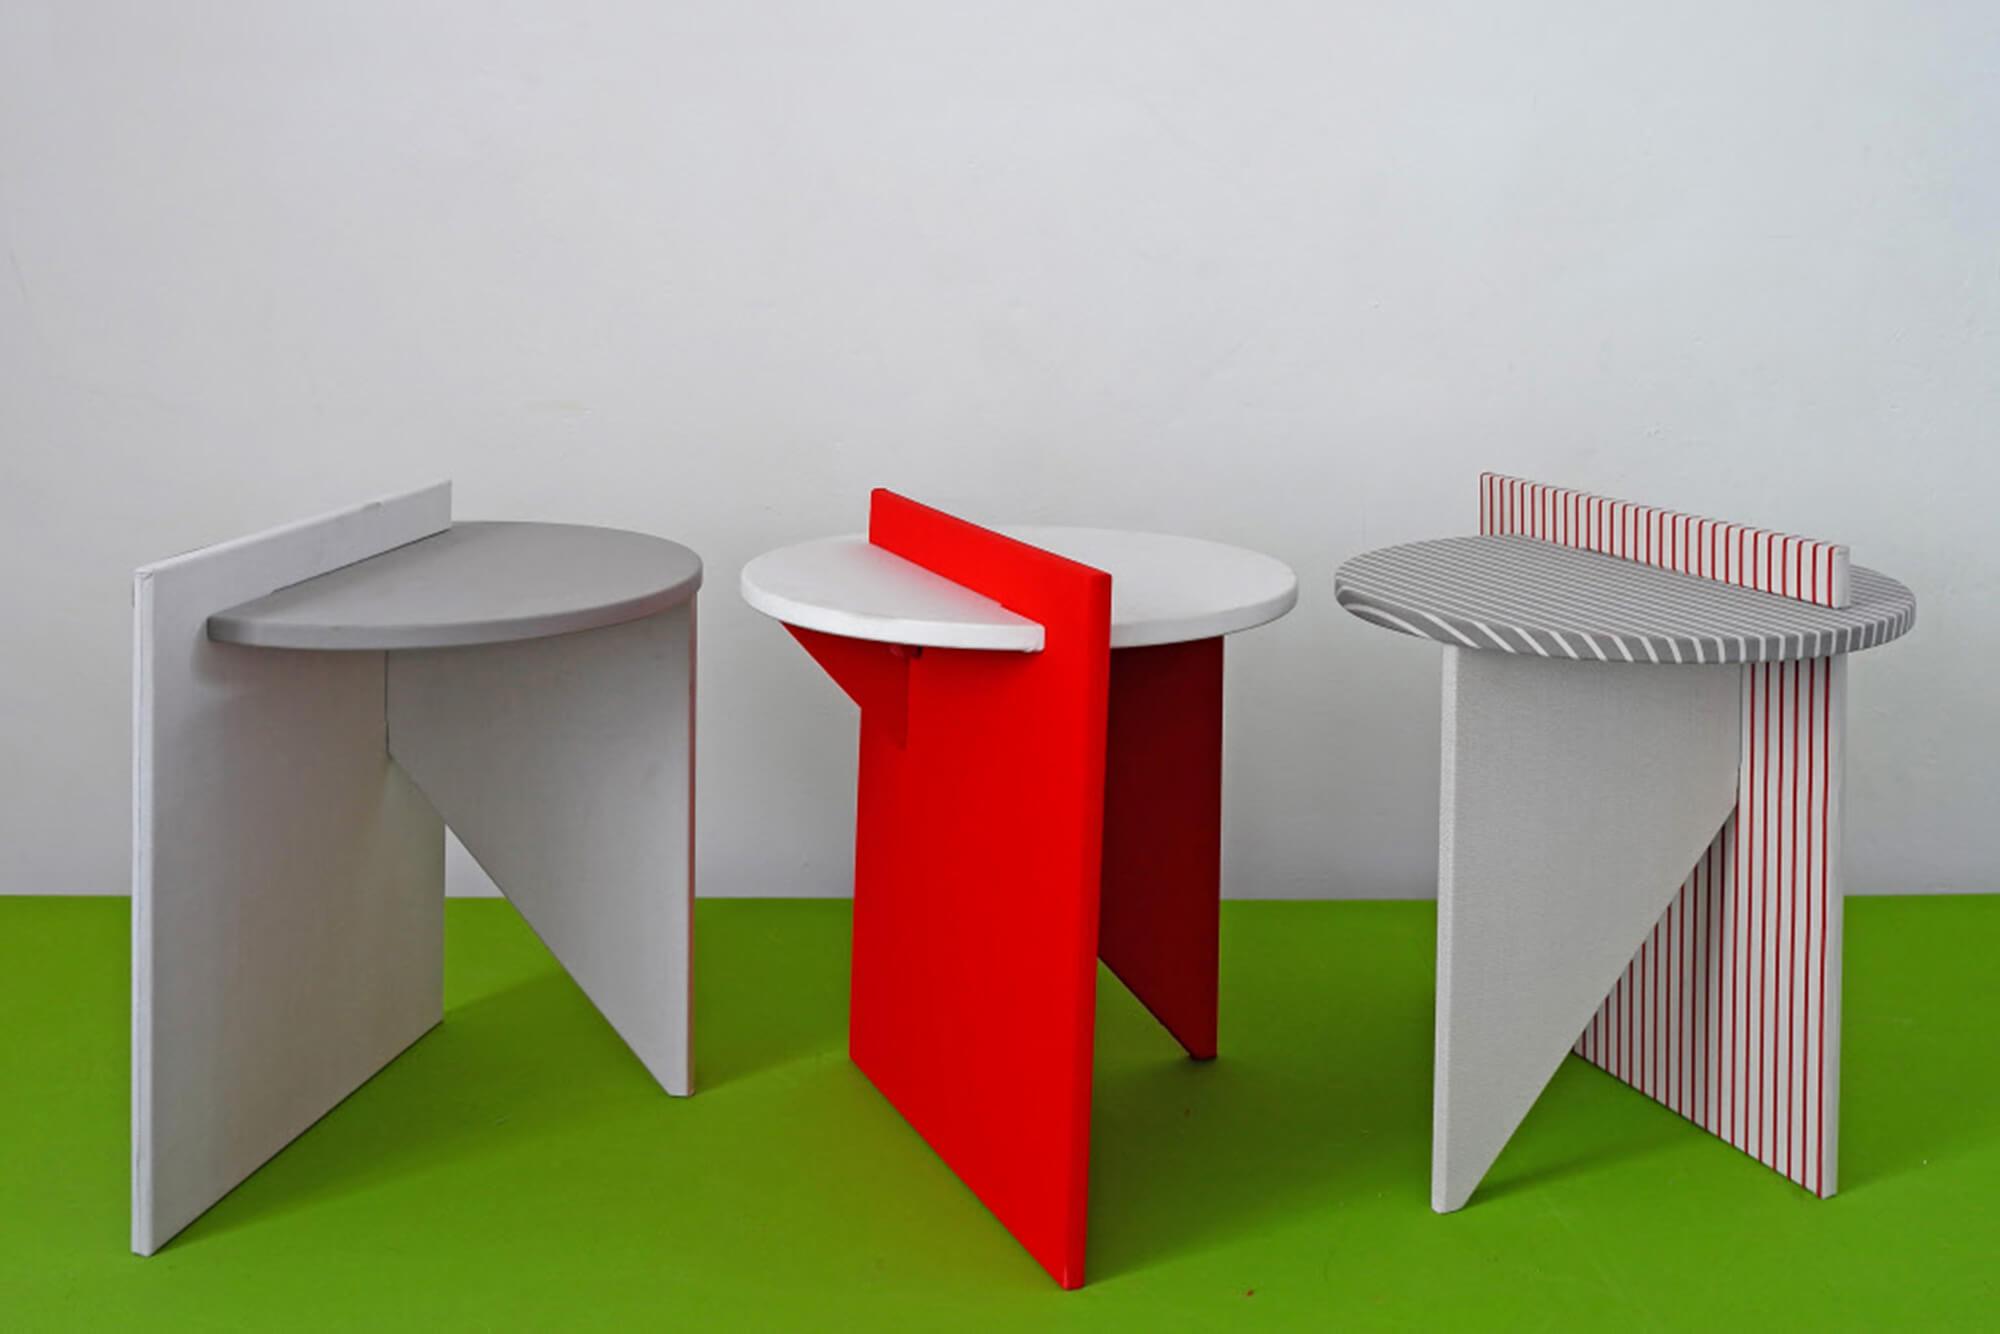 Приставные столики Atelier Lavit красного и белого цвета